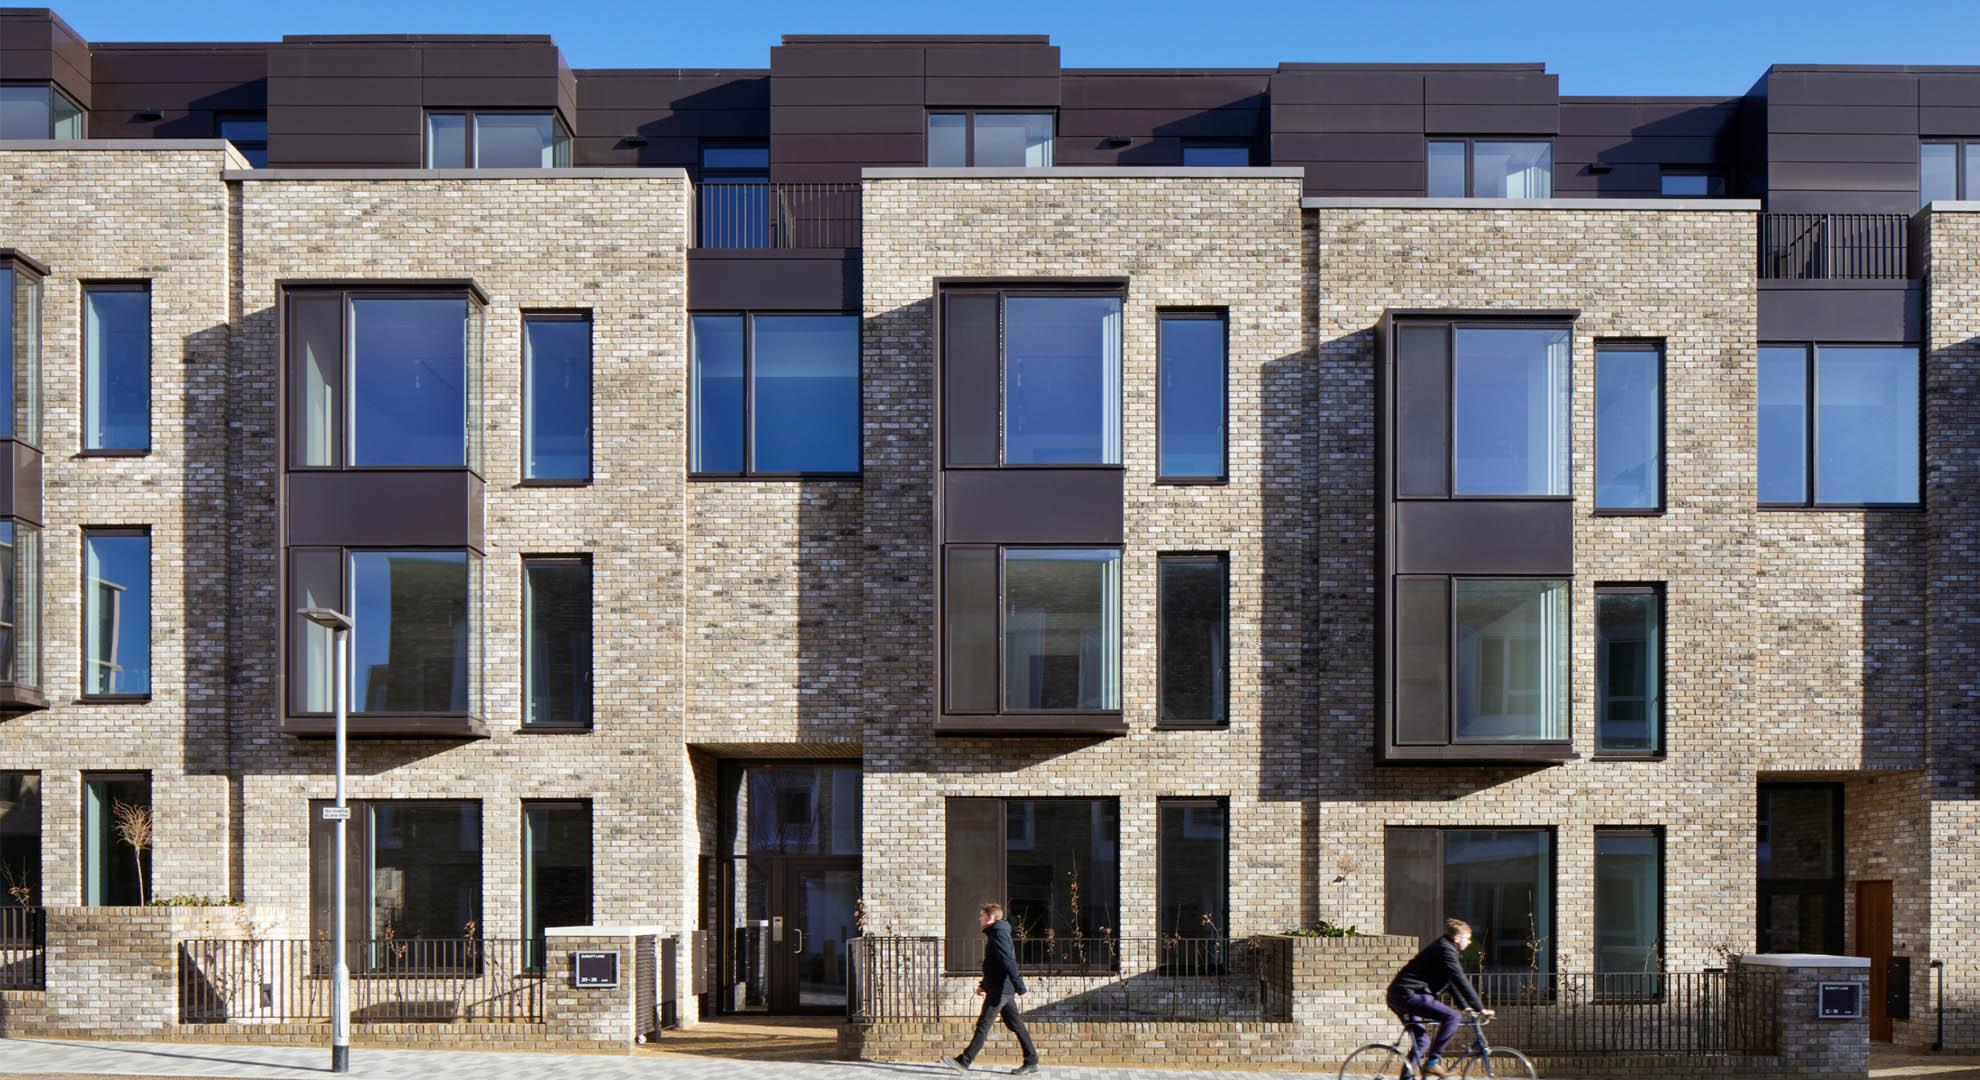 Eddington Village is predicted to achieve net zero carbon emissions